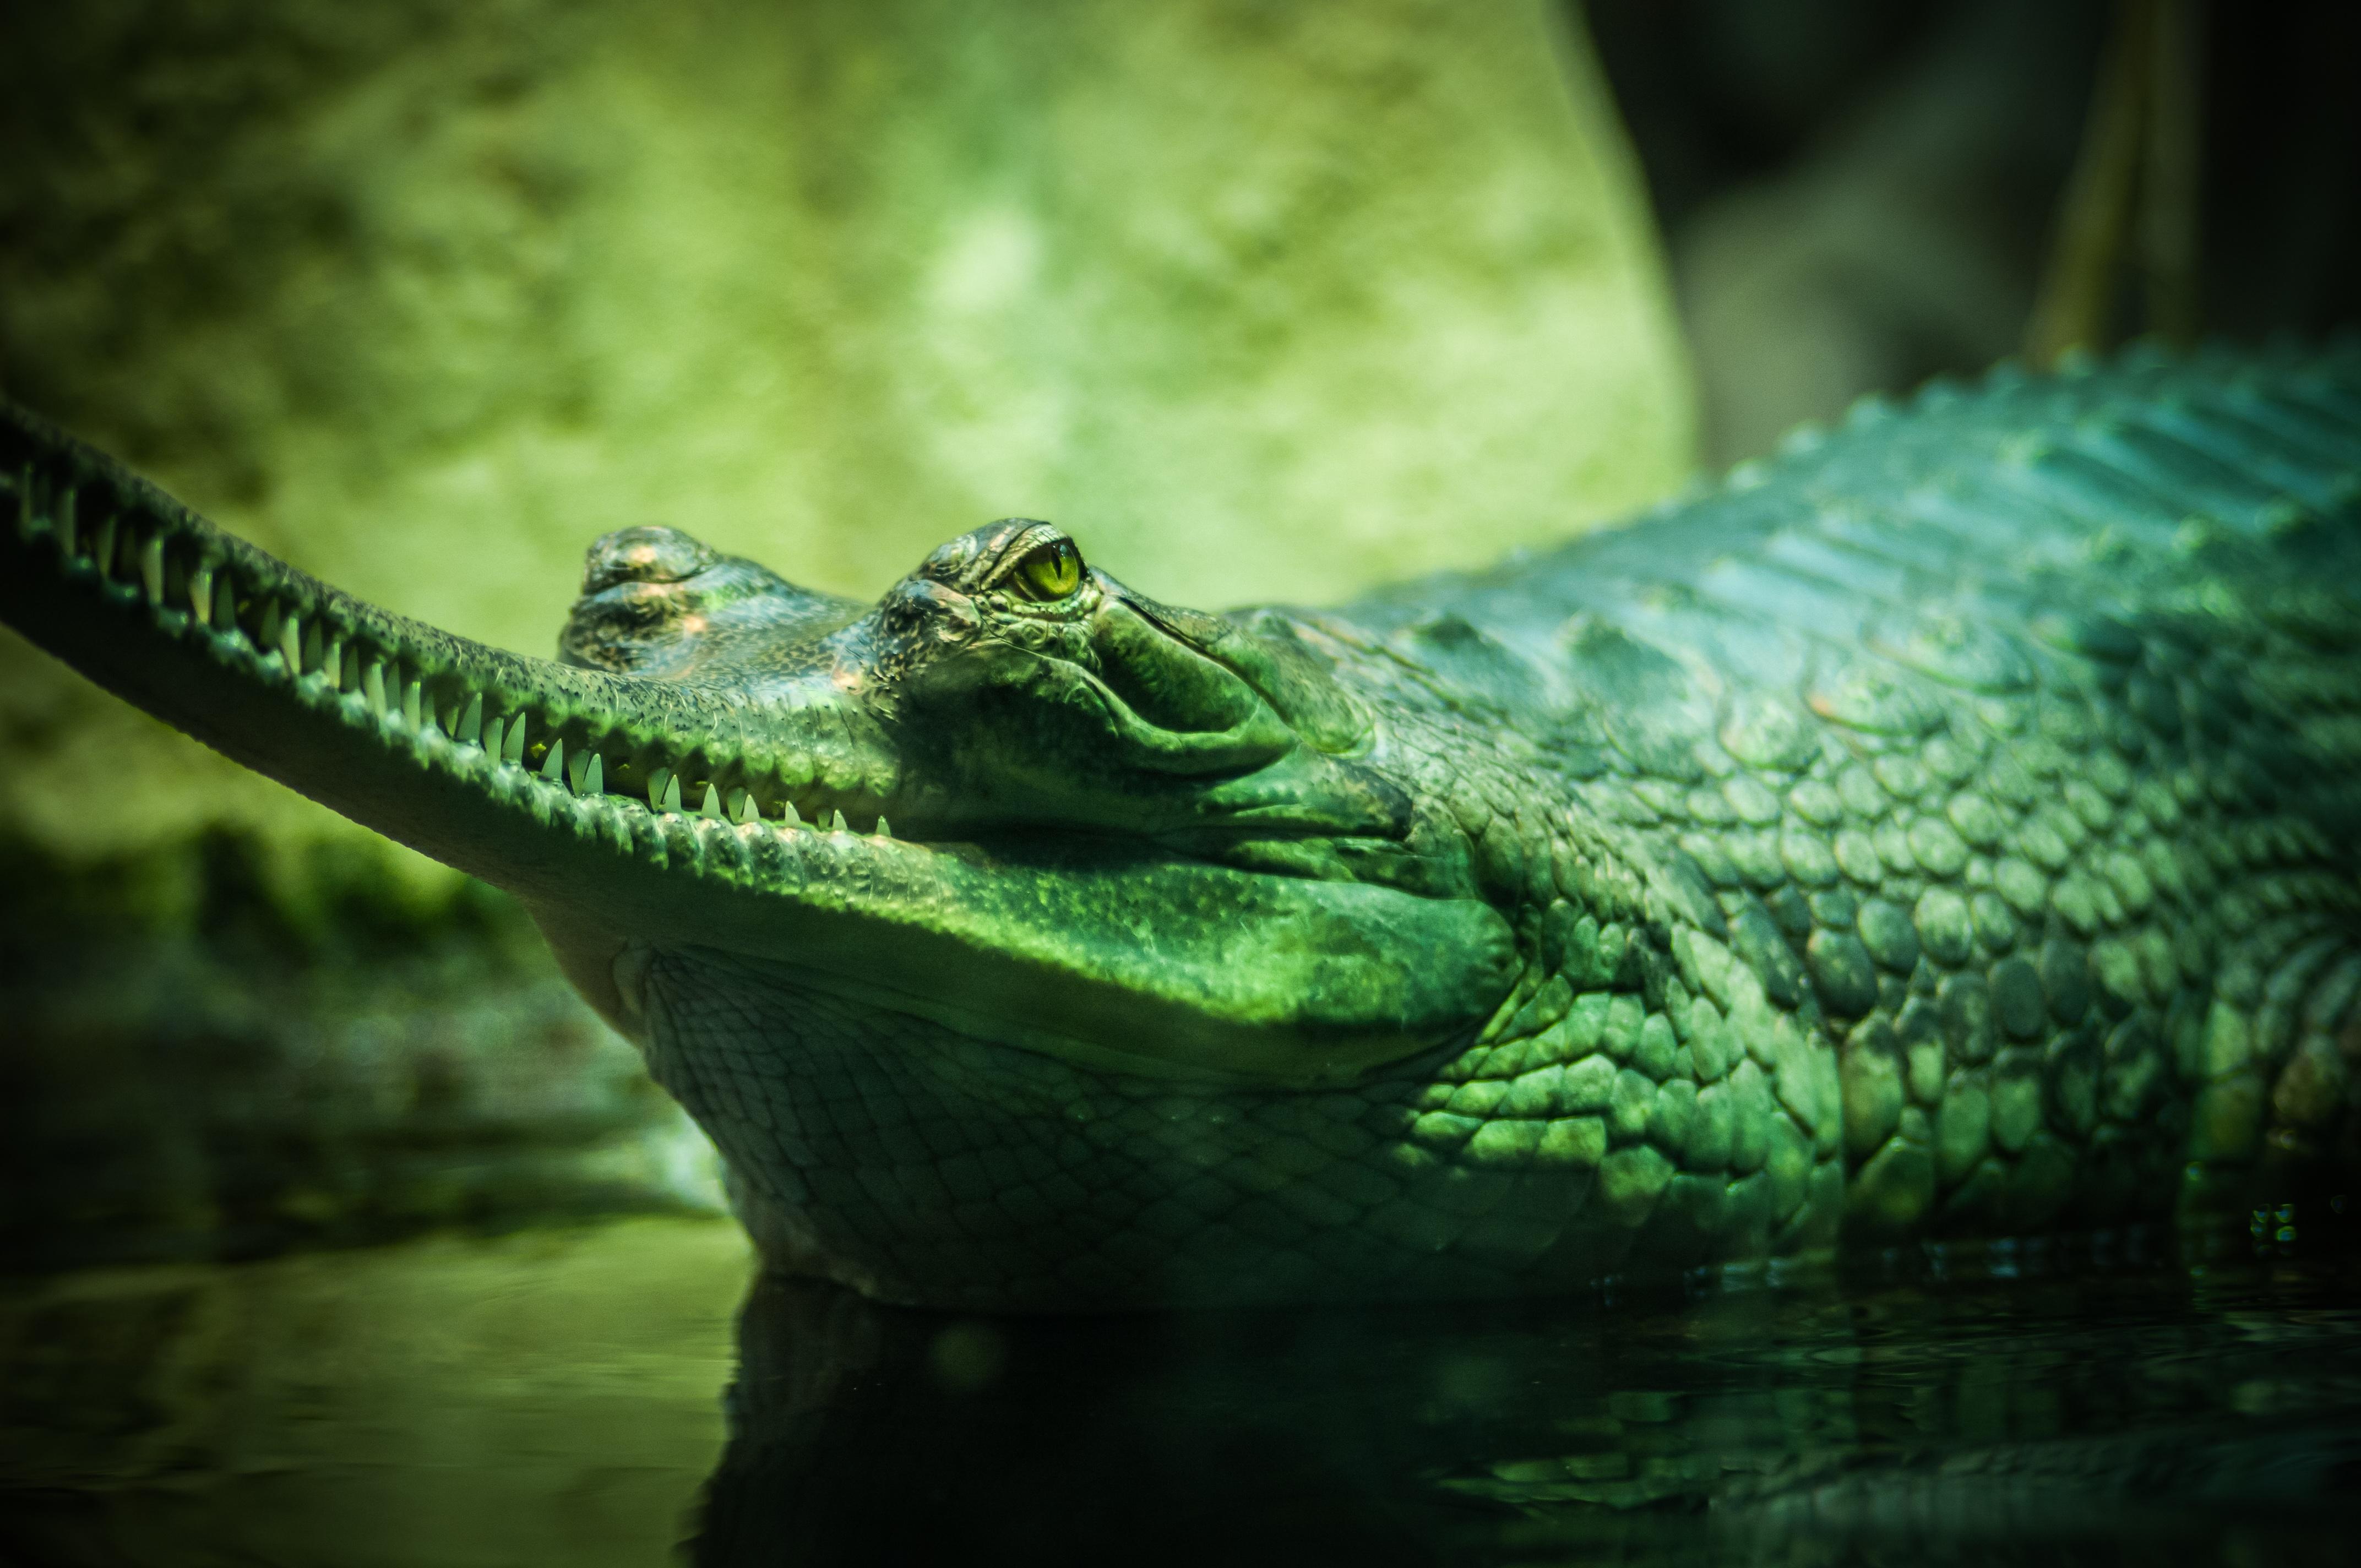 Forgotten Horrors: Ant-Walking Alligators of Hiroshima Free pictures of alligators